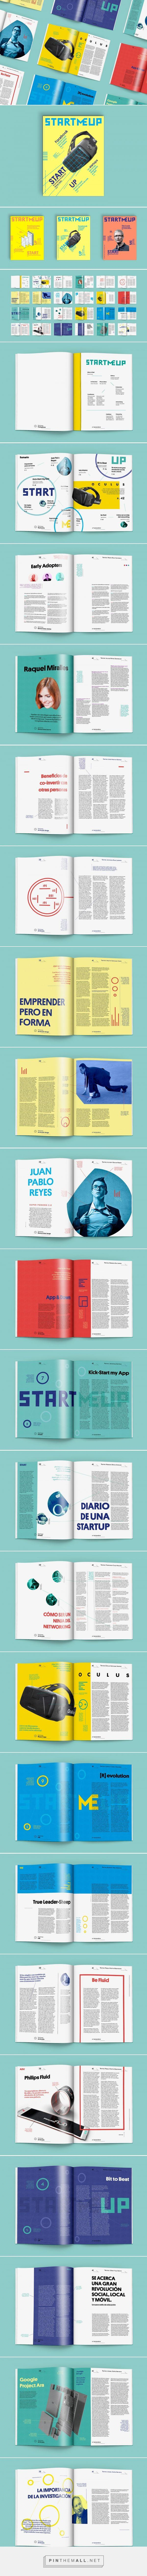 StartMeUp Mag Look & Feel